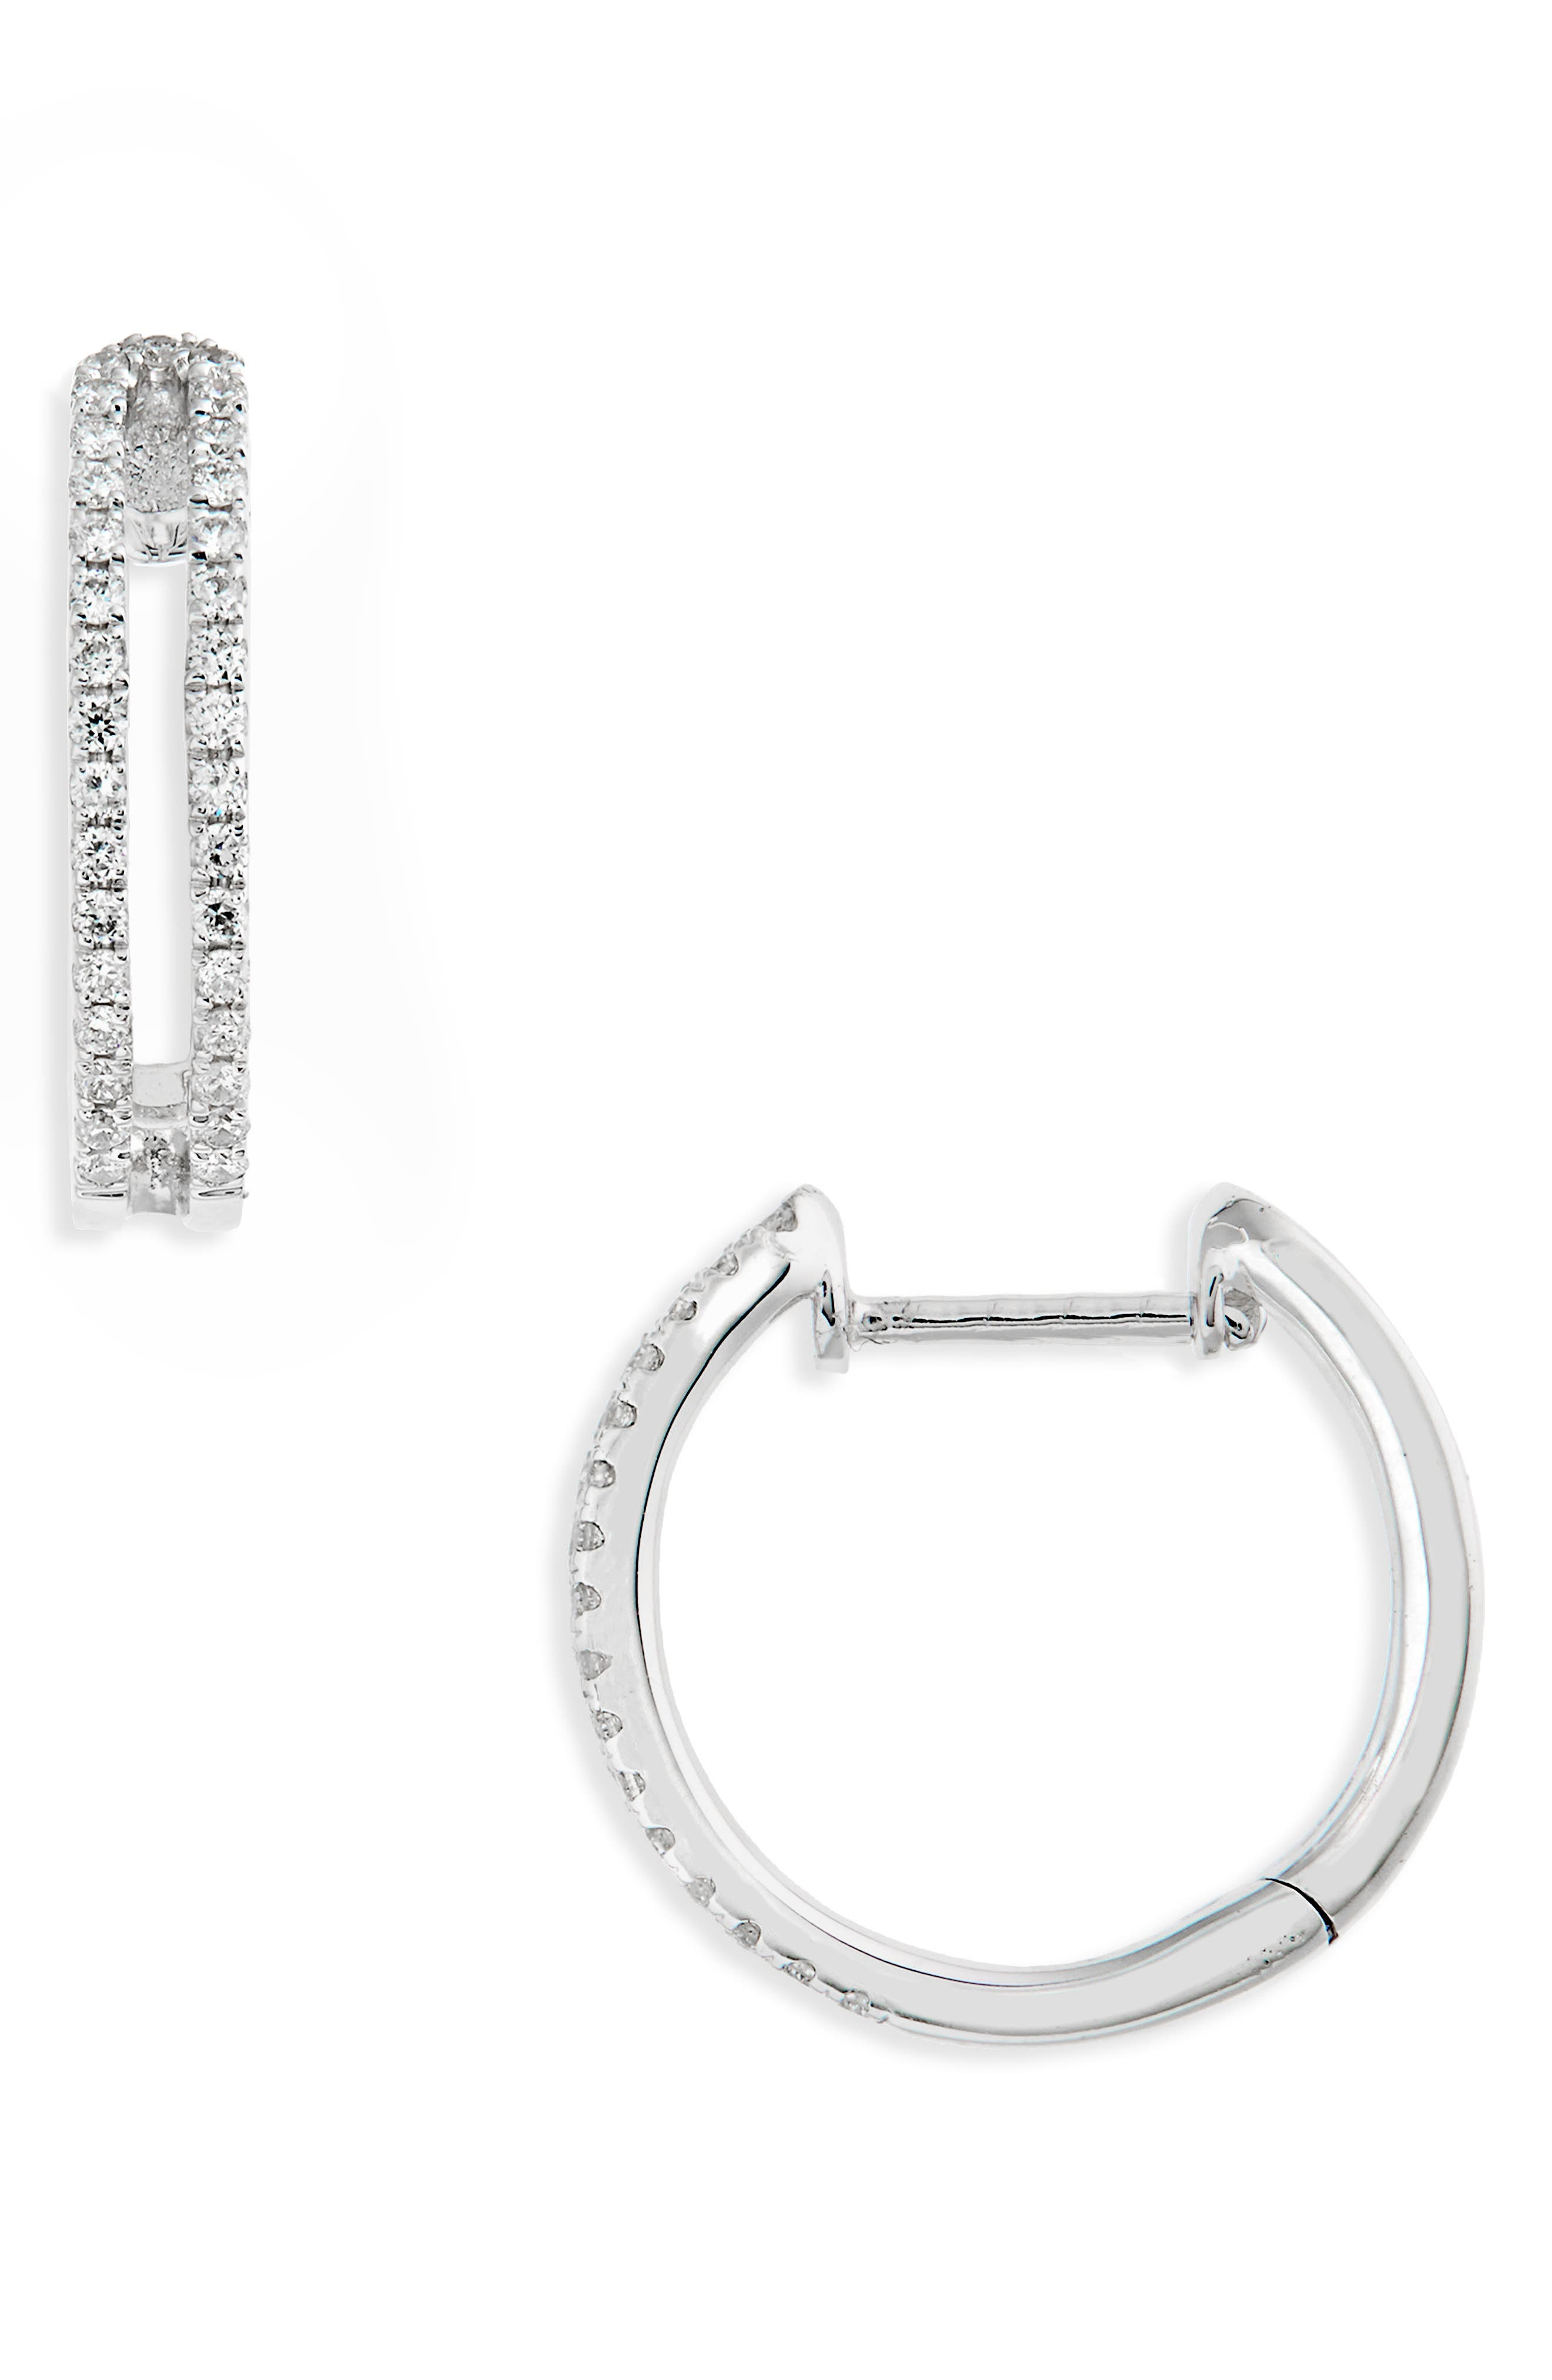 Geo Diamond Hoop Earrings,                             Main thumbnail 1, color,                             WHITE GOLD